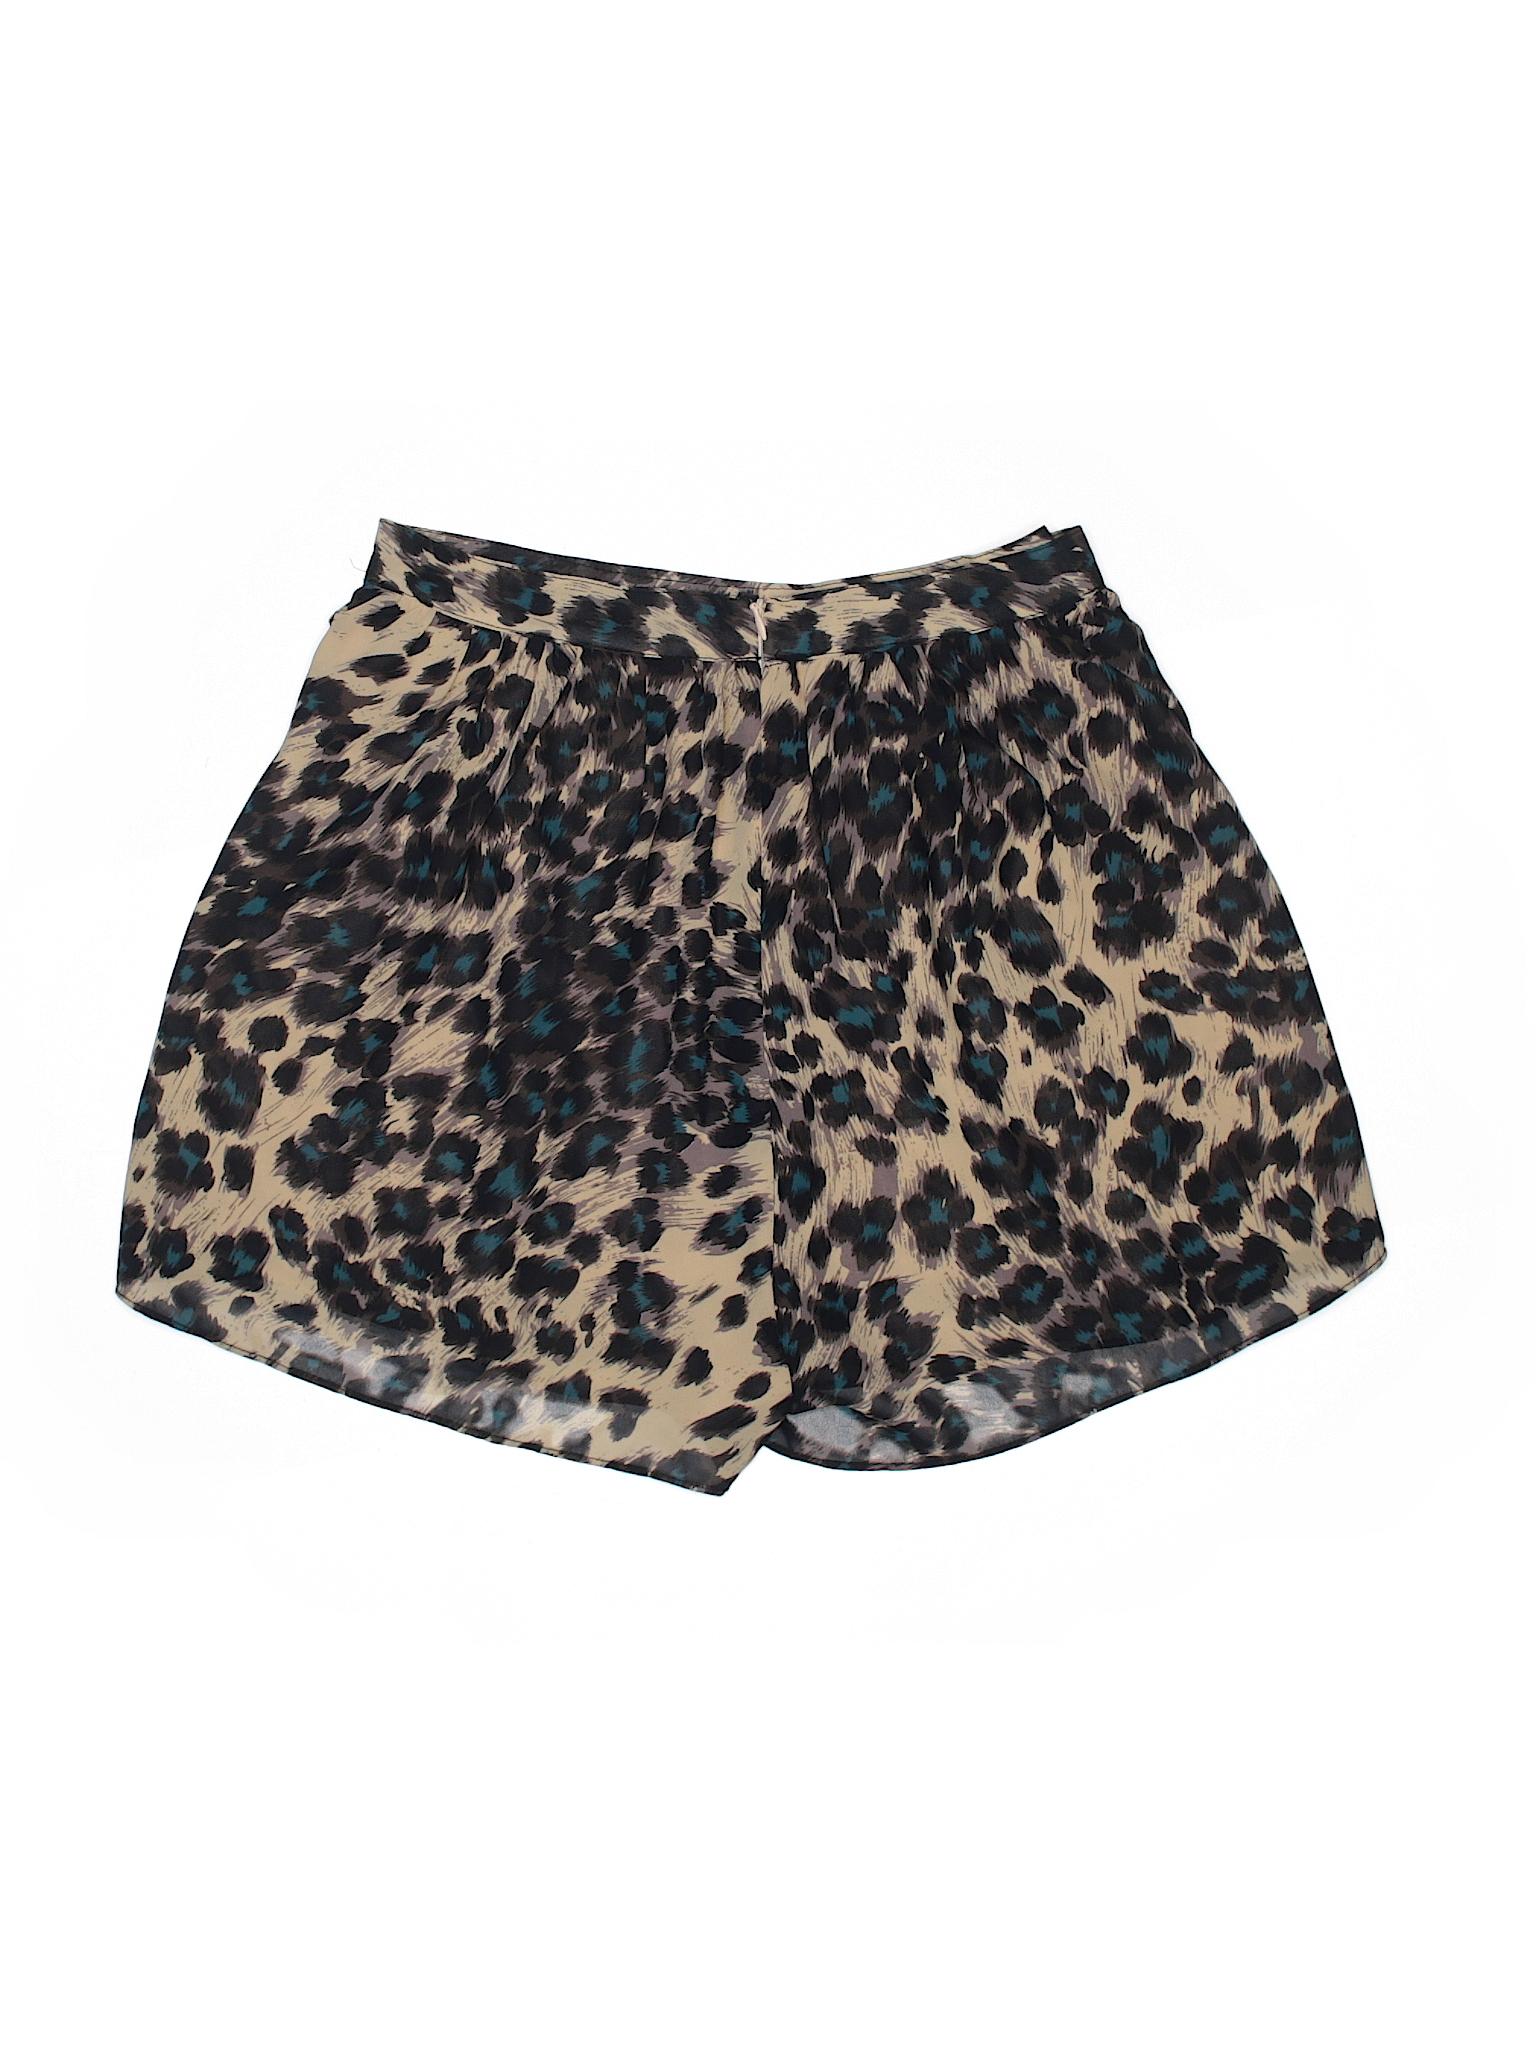 k5IrWfpRhn Ark amp; Boutique Dressy Shorts RwdZqvzvEW